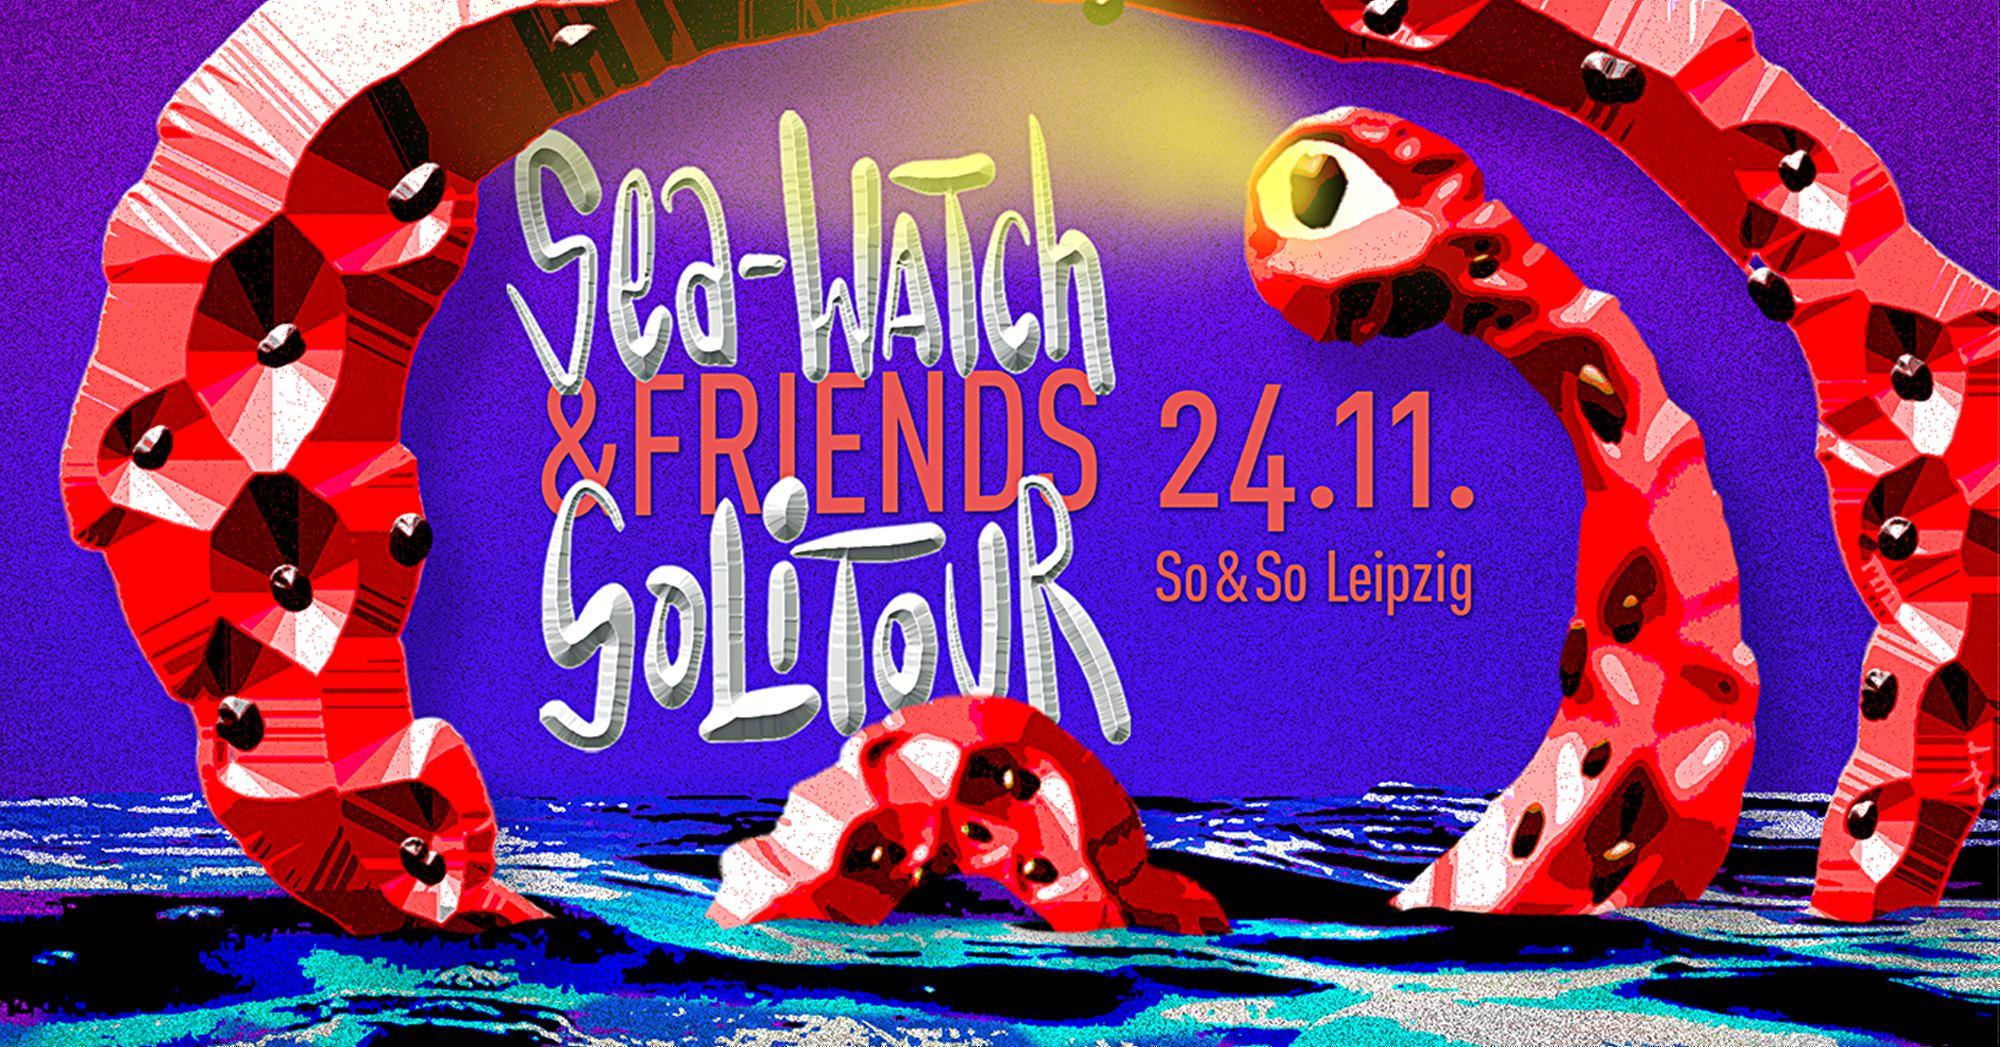 Sea-Watch & Friends Solitour in Leipzig m/ dapayk, Santi & Tugçe